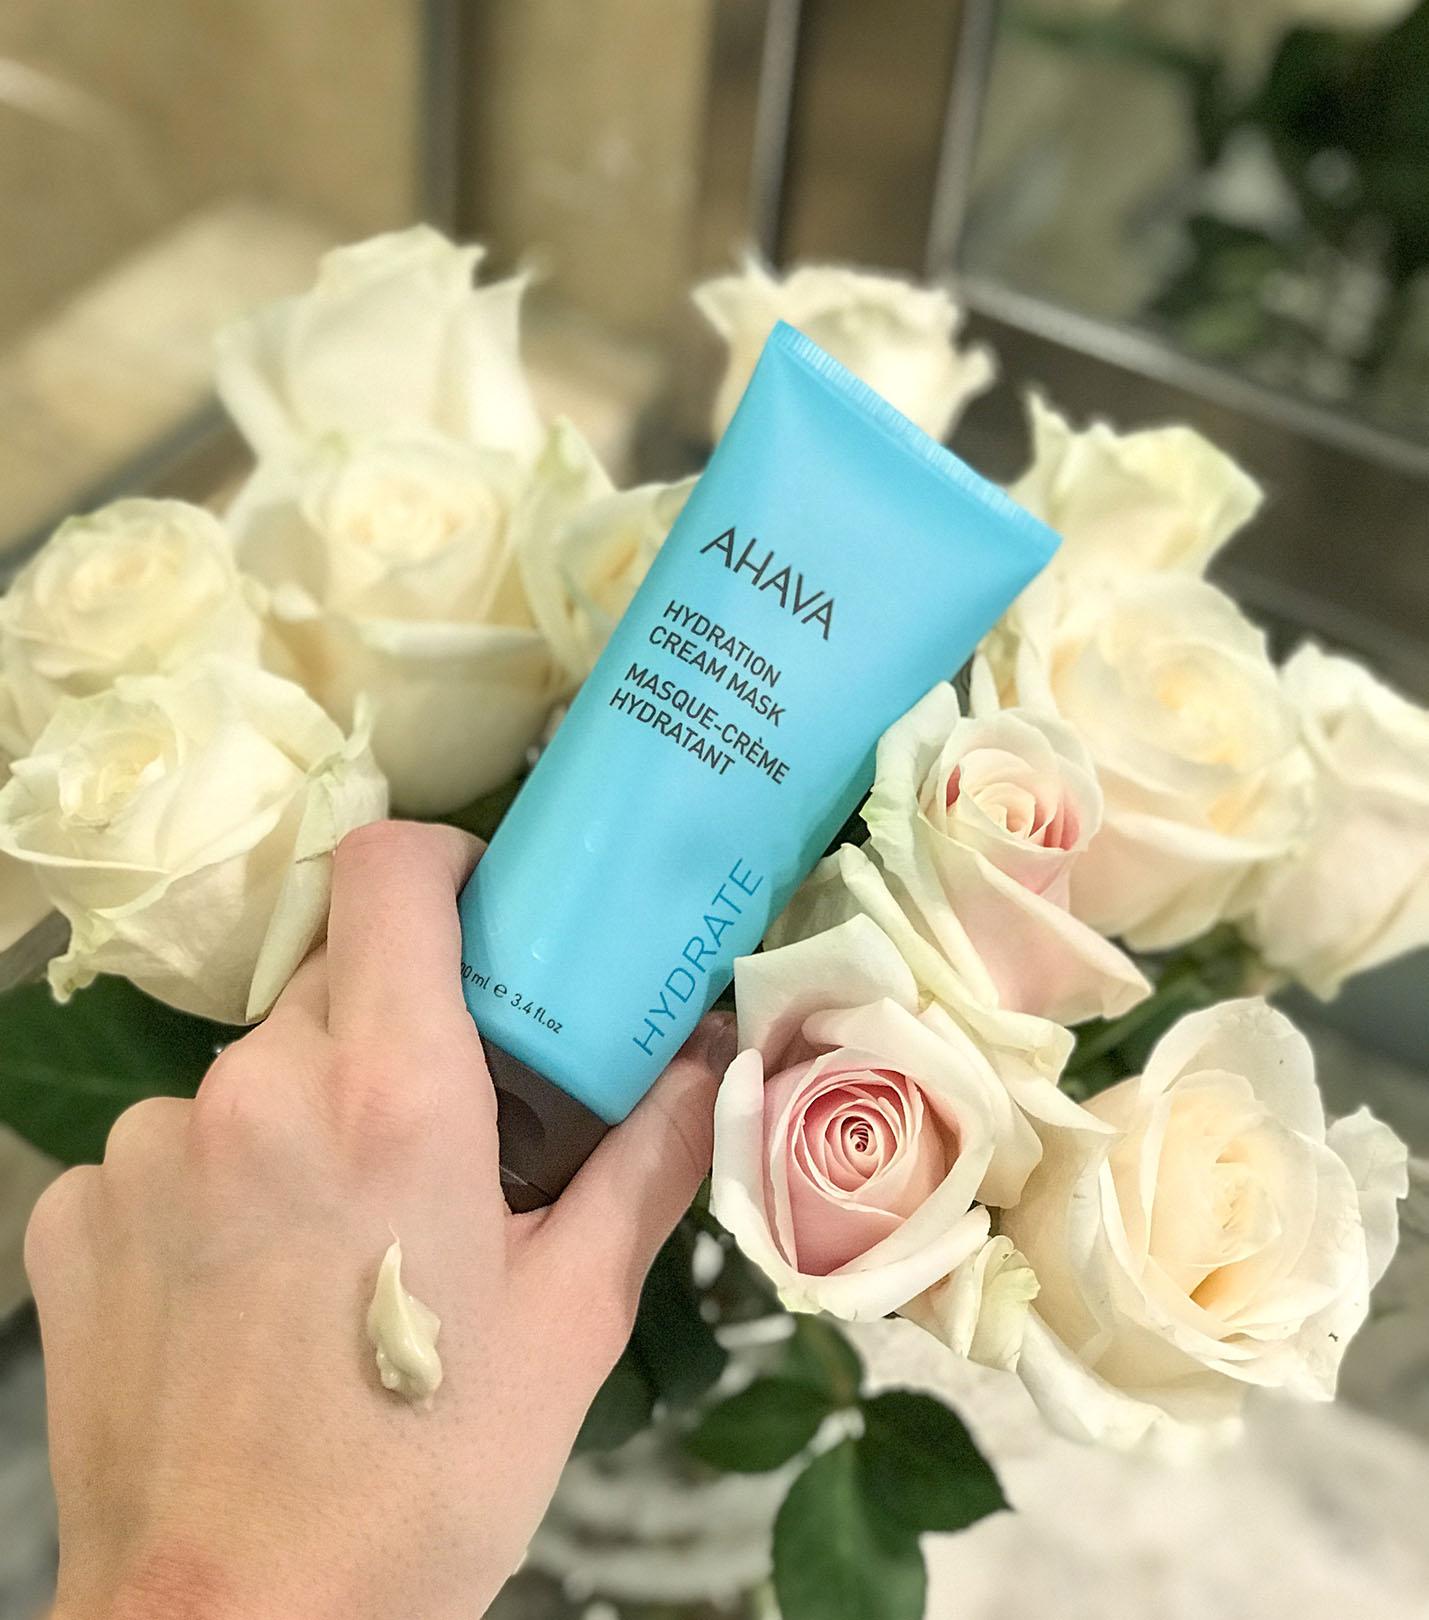 Ahava Facial Cream